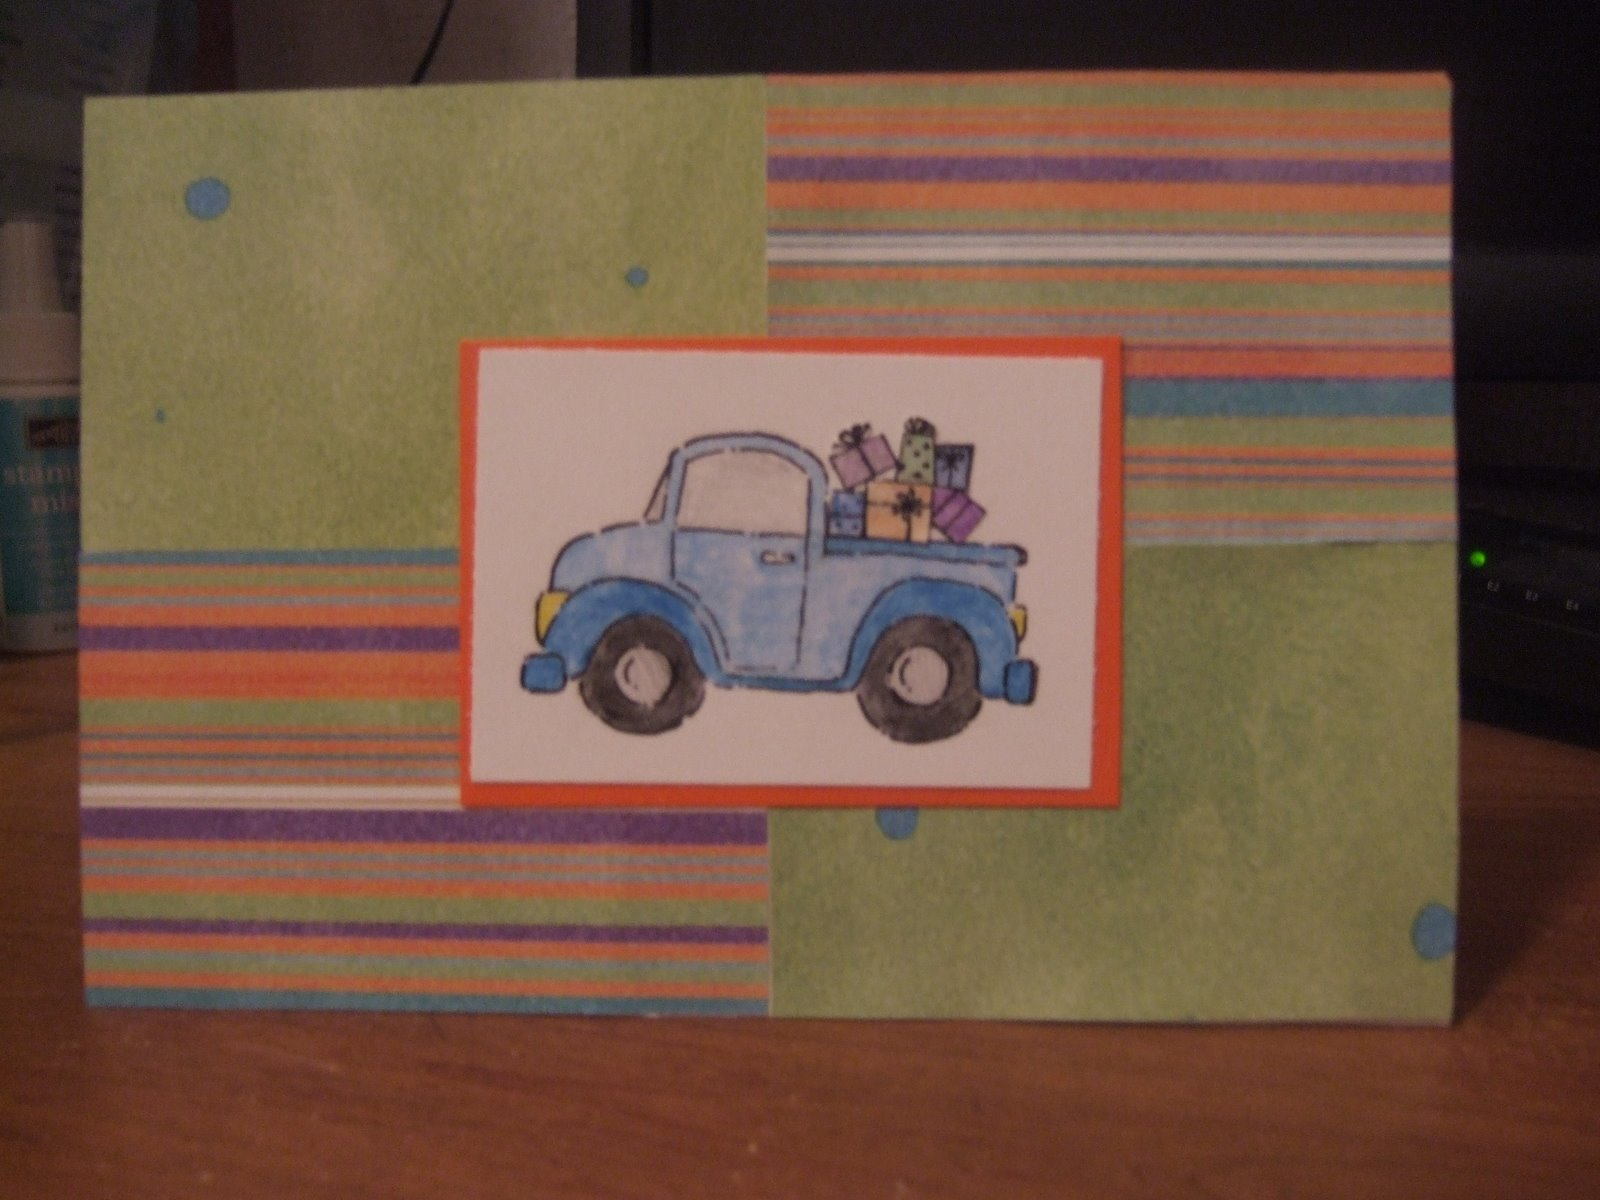 [BOY+CARDS+010.jpg]